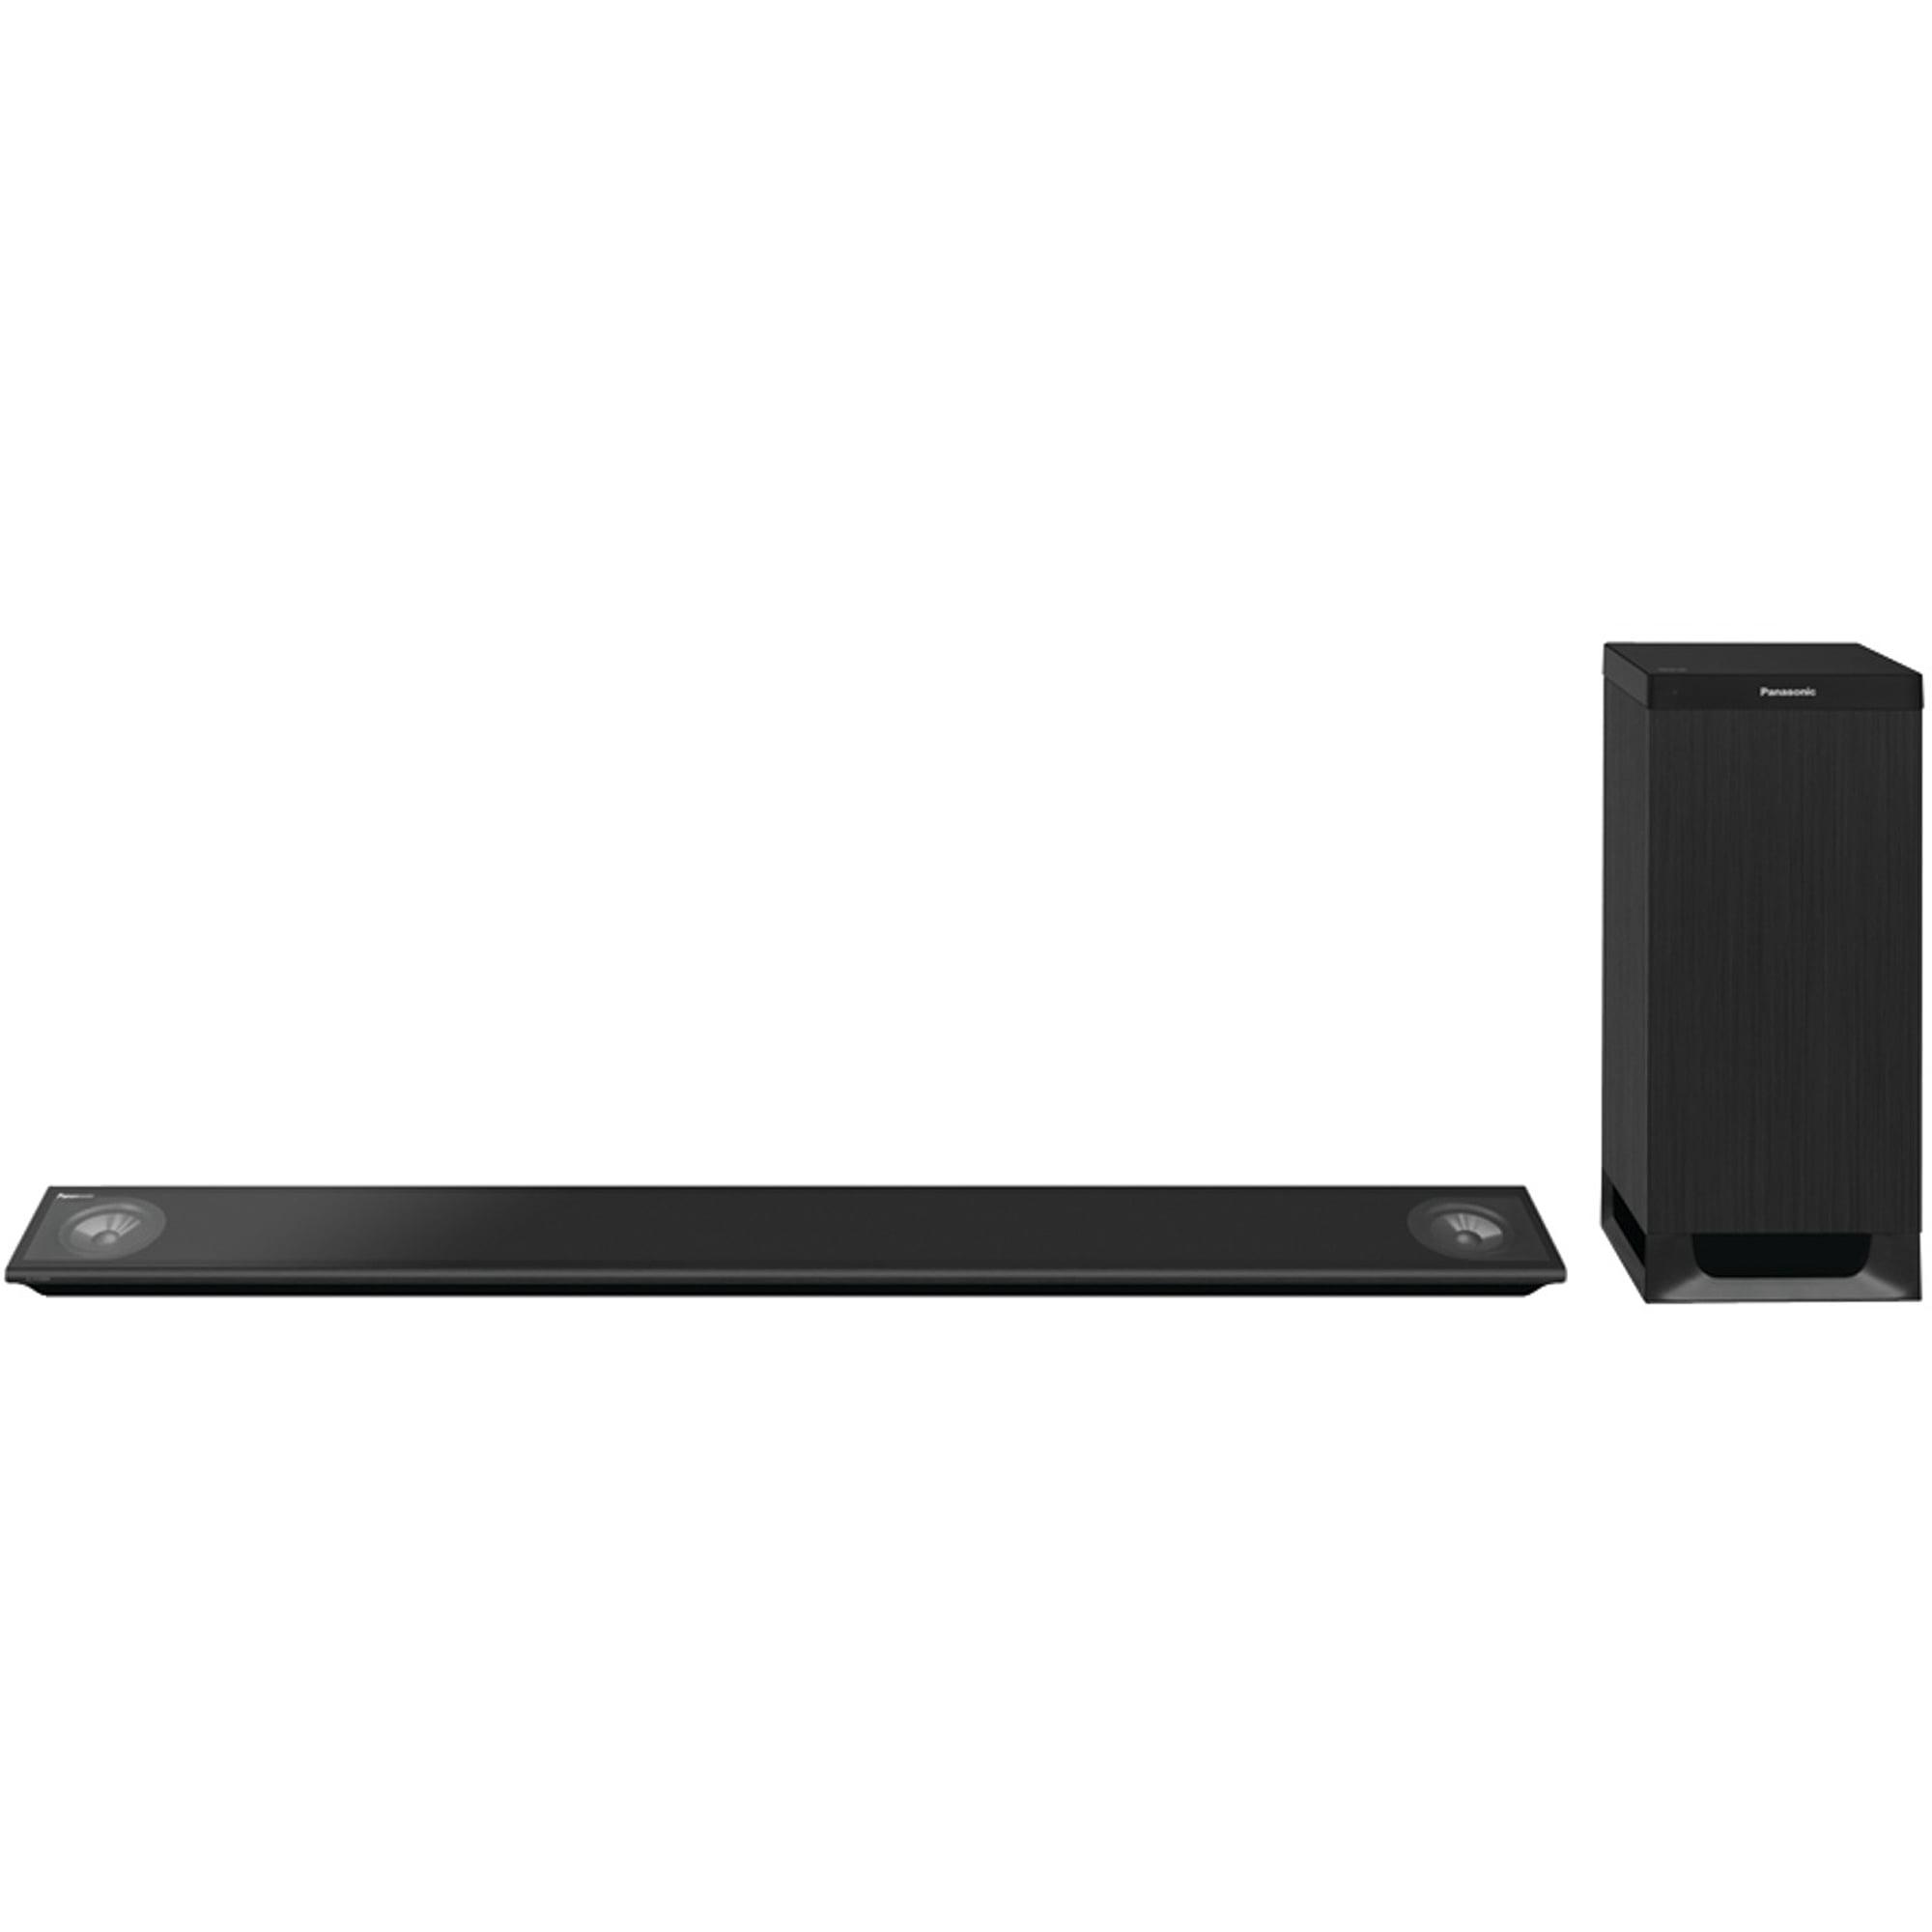 Panasonic SC-HTB880 5.1-Channel Cinema Surround Soundbar with Bluetooth and NFC